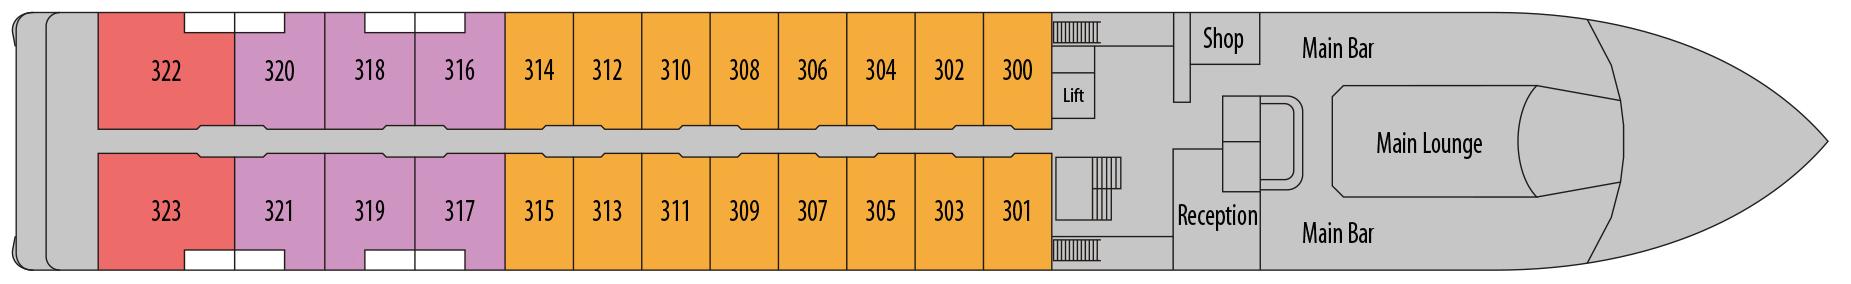 Douro_Elegance_Deck_Plan Upper Deck.jpg